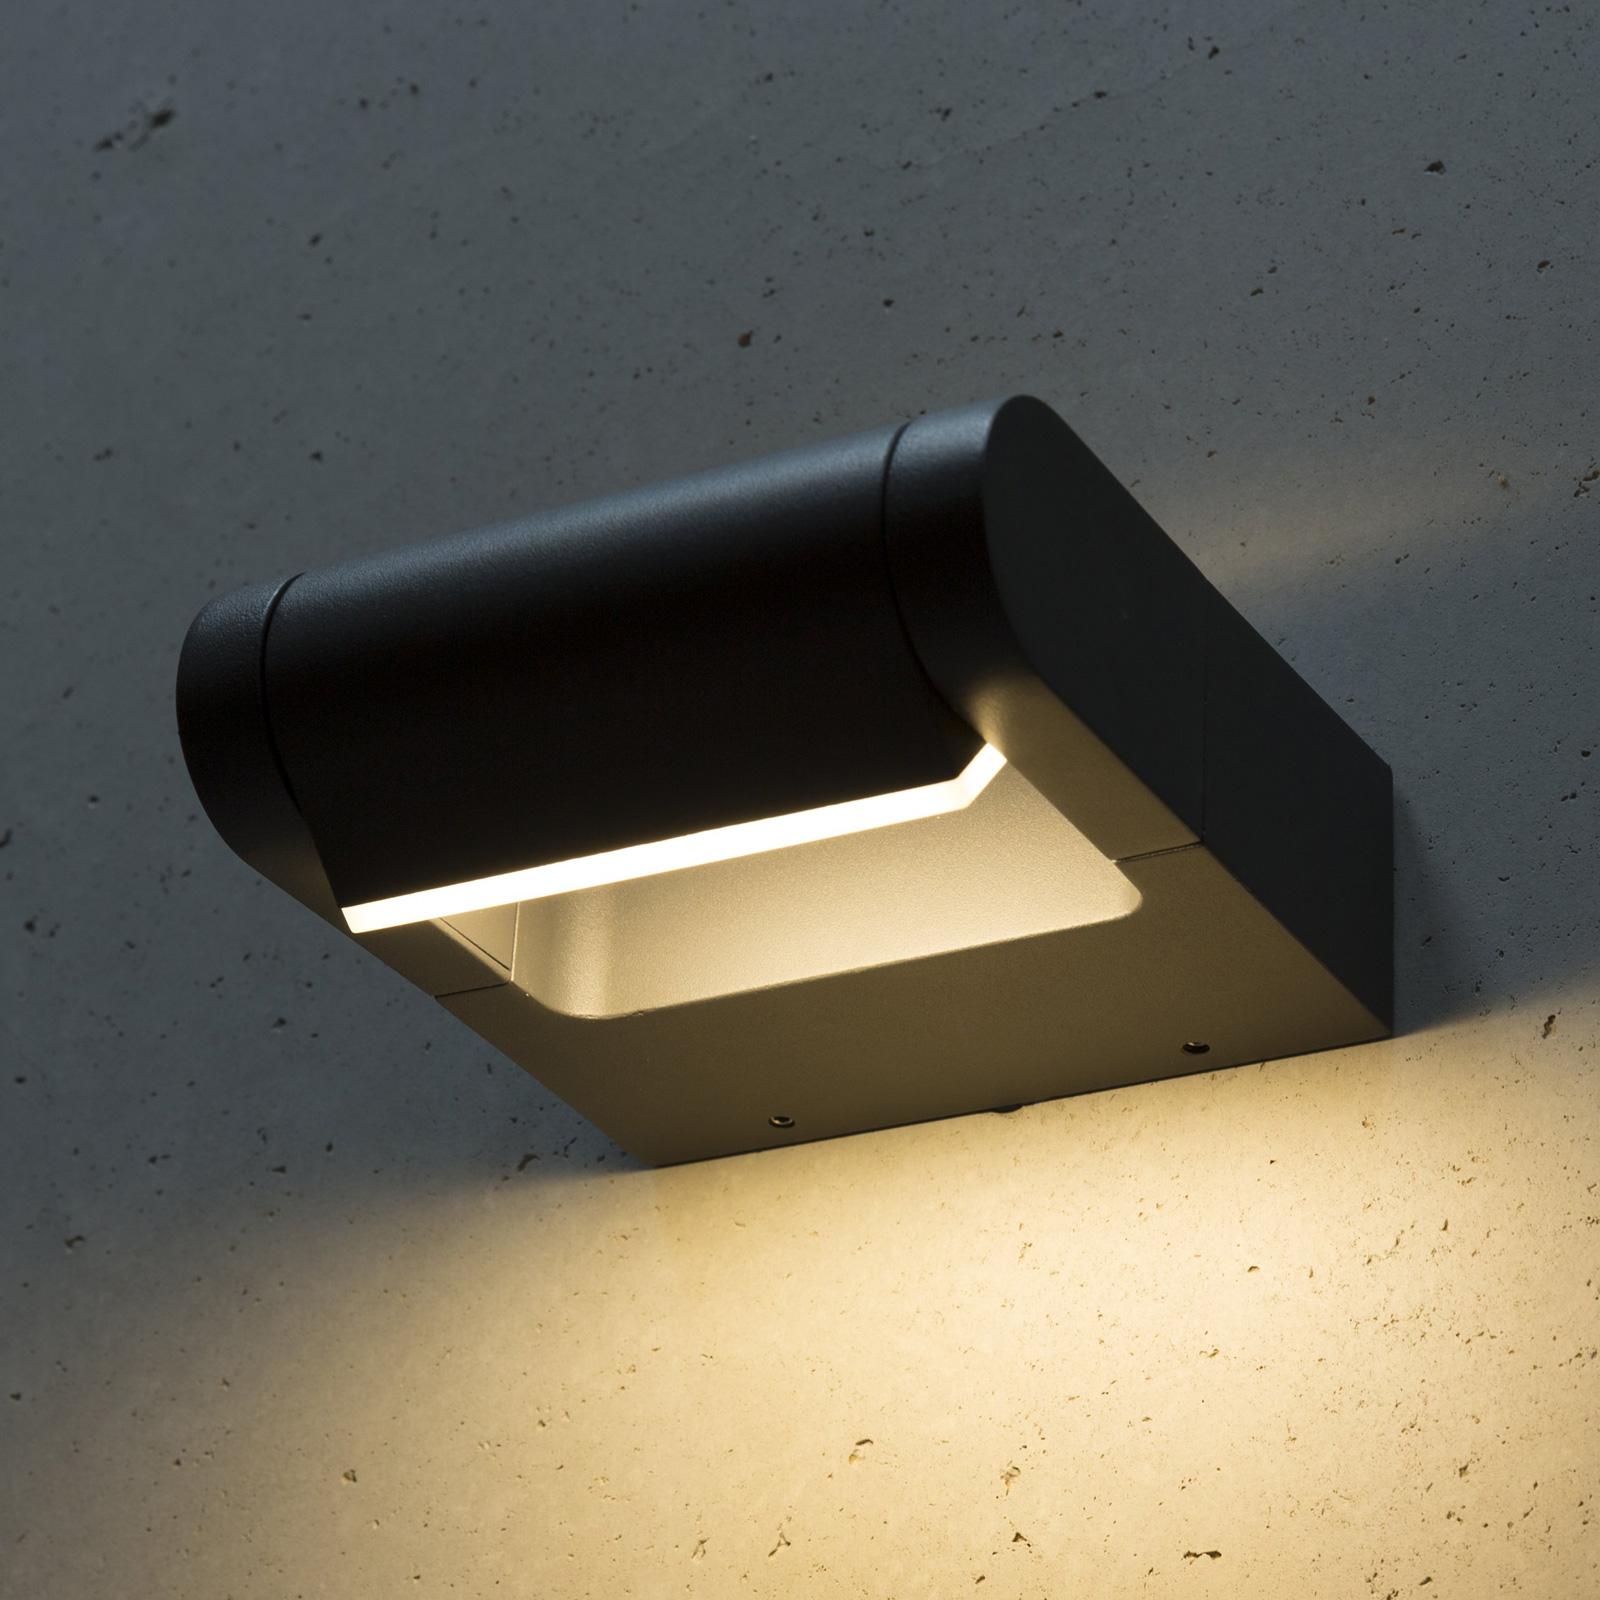 LED-ulkoseinälamppu Estilo, IP54